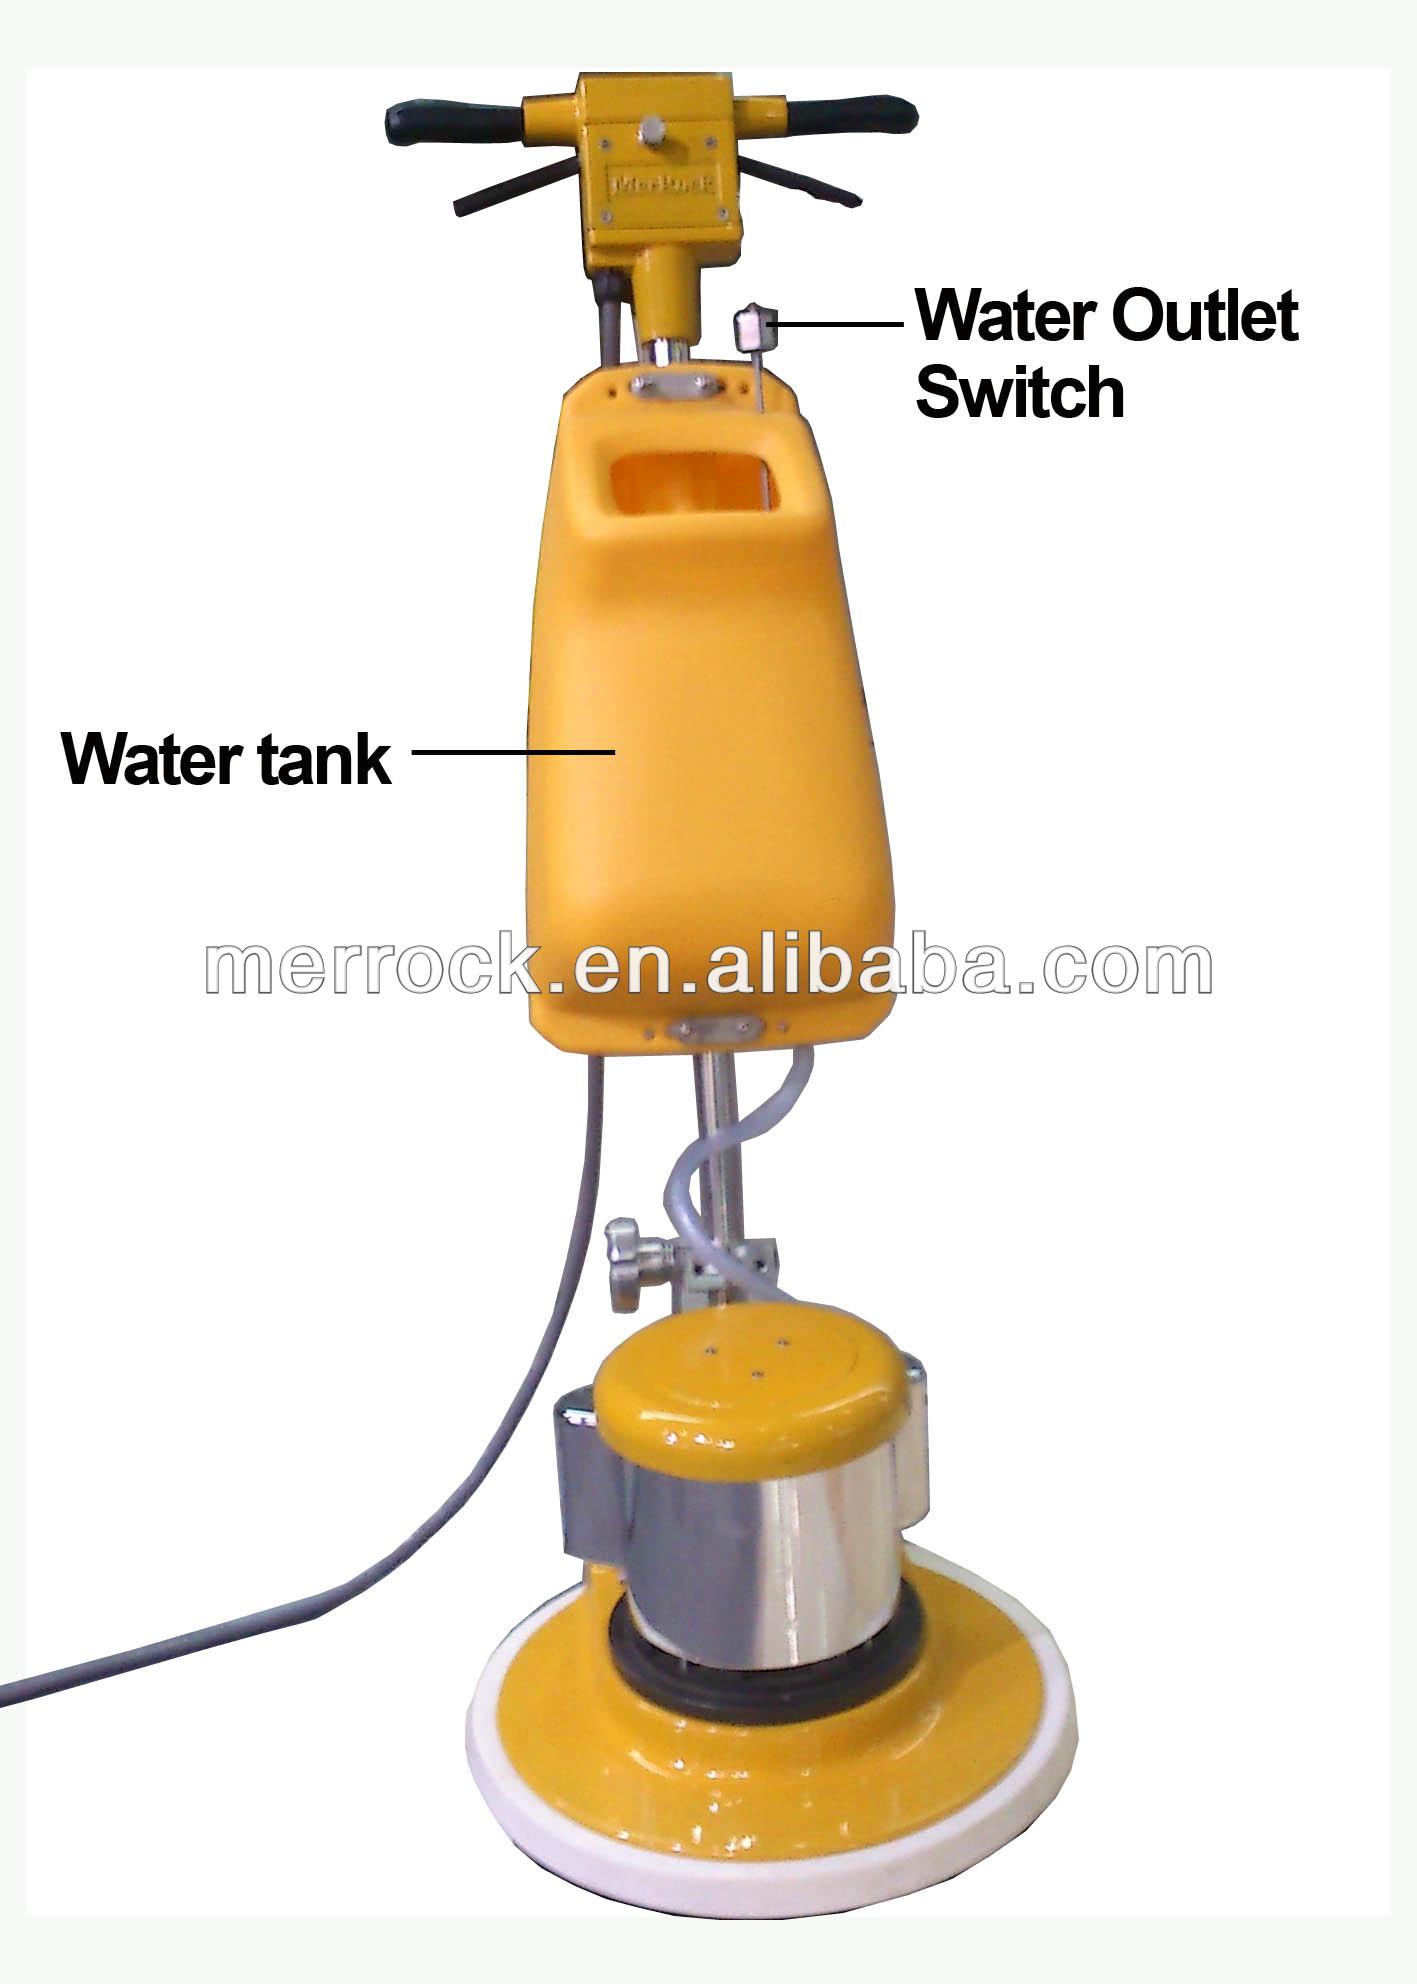 Stone floor cleaning machine buy stone floor cleaning for Concrete floor cleaning products